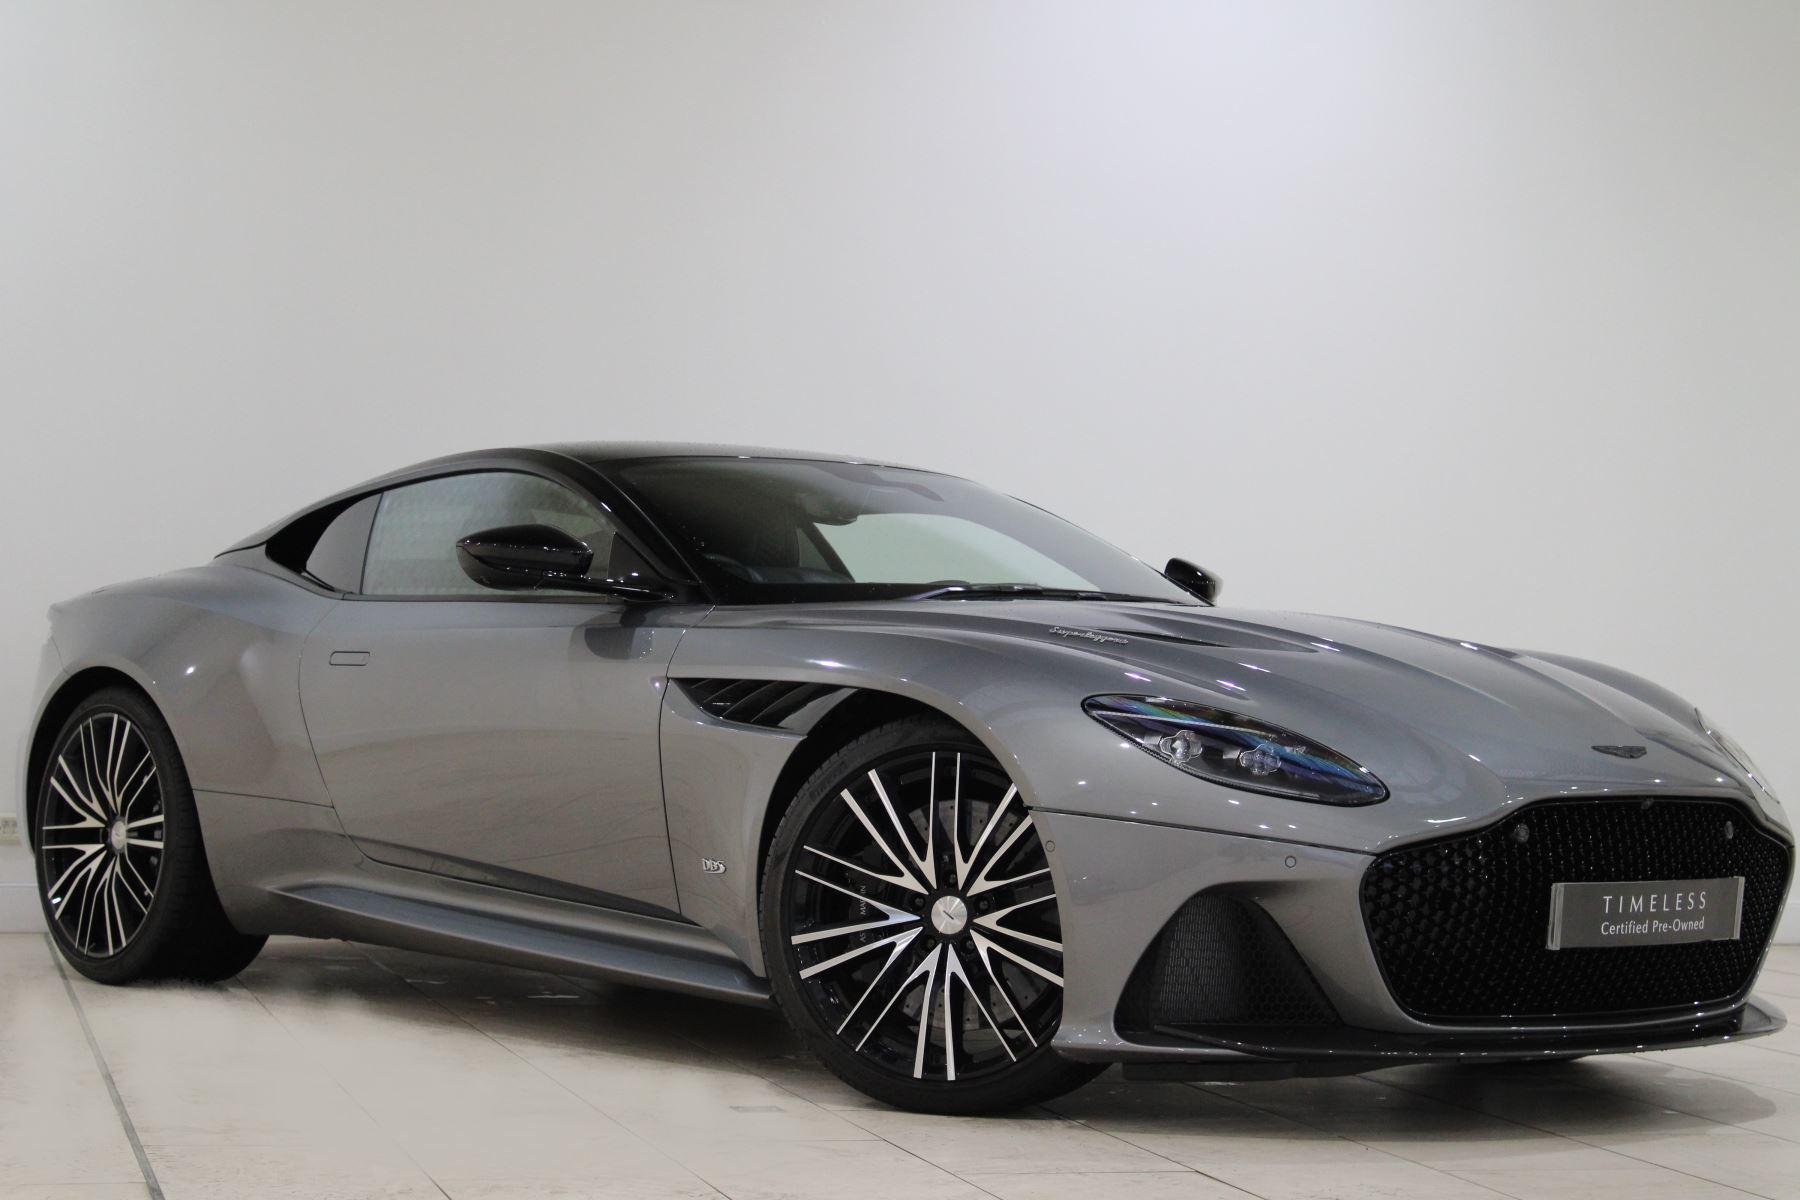 Aston Martin DBS V12 Superleggera 2dr Touchtronic 5.2 Automatic Coupe (2020) image